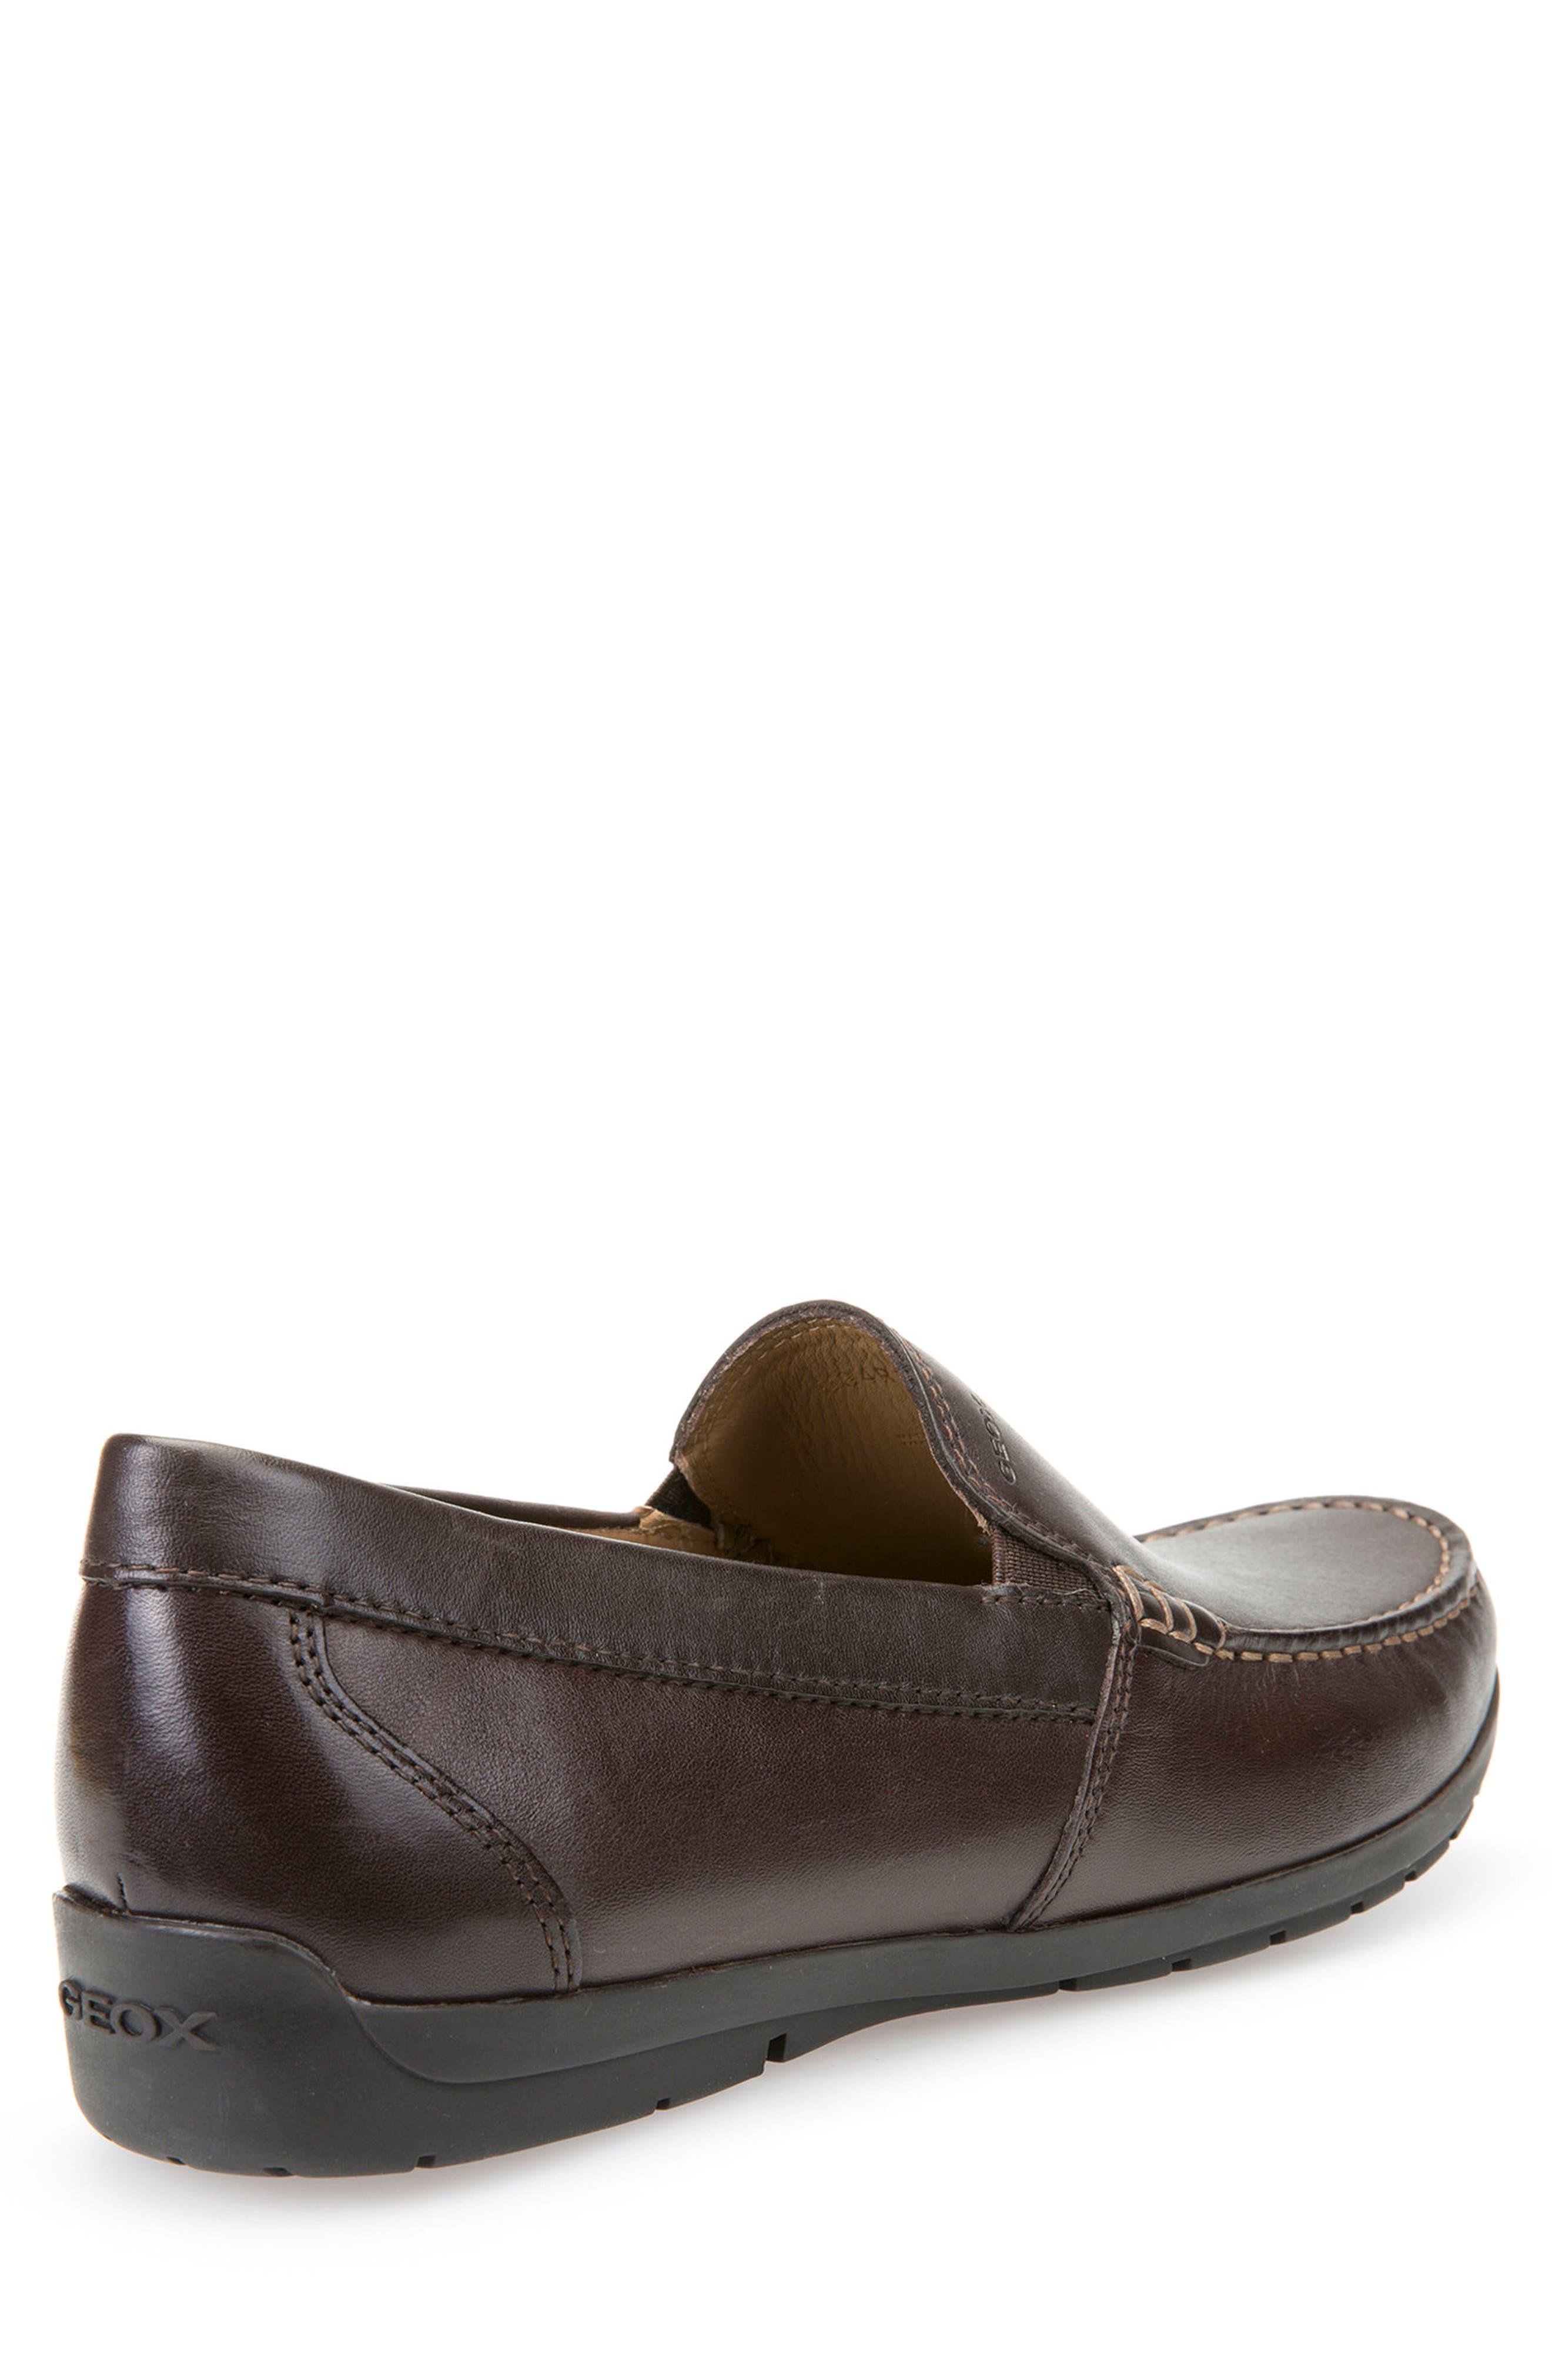 'Simon W2' Venetian Loafer,                             Alternate thumbnail 2, color,                             BROWN LEATHER